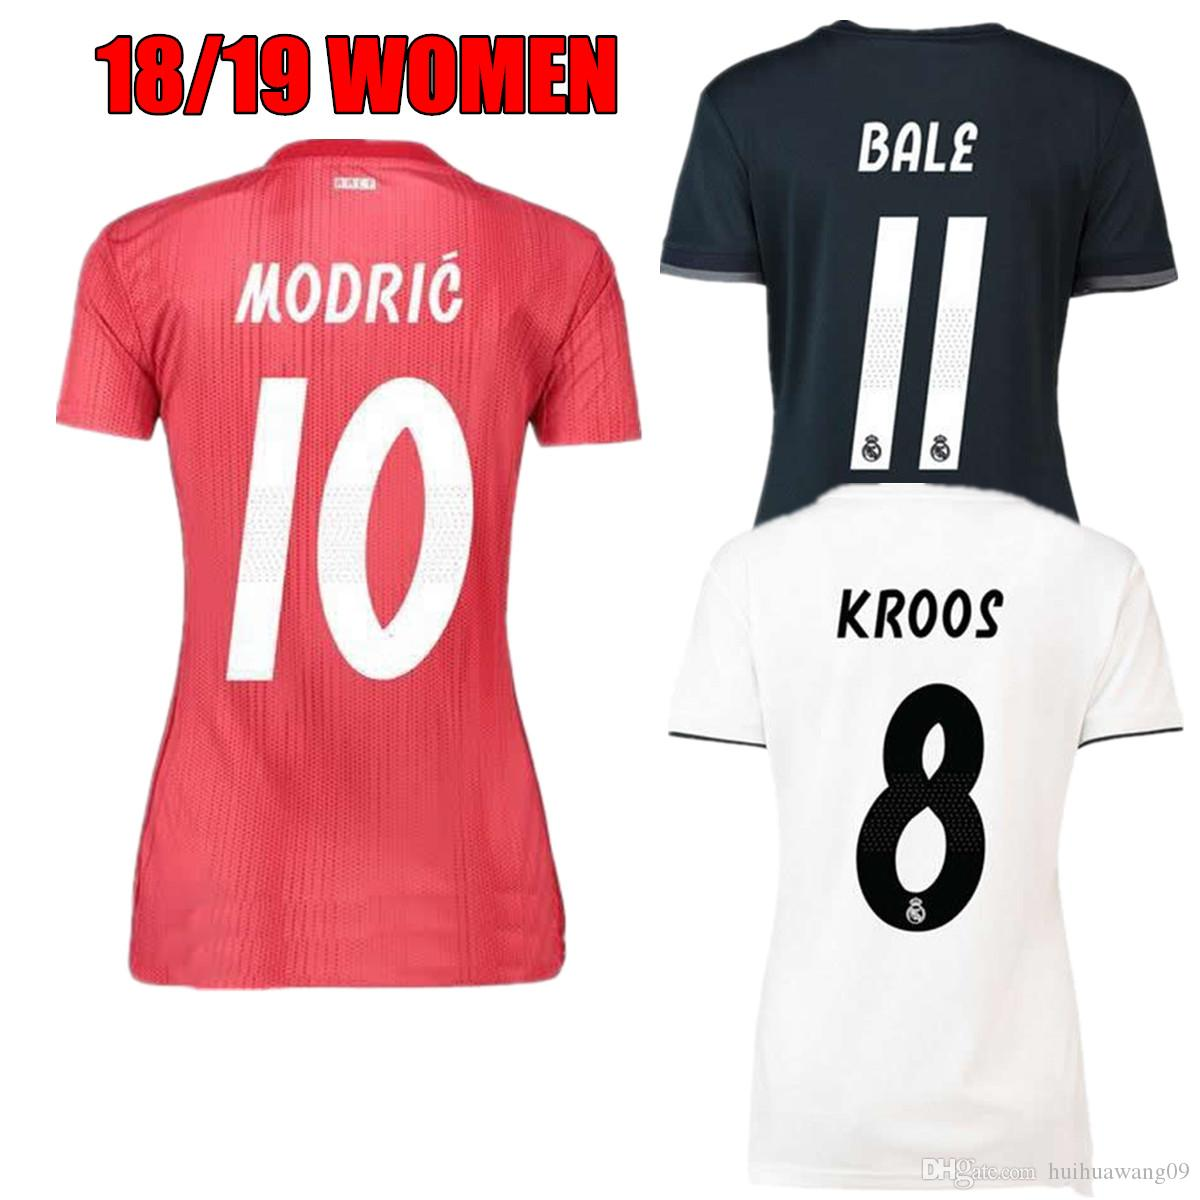 cf1947fe10 Compre 2018 2019 Mulheres Real Madrid Red Terceira Camisa De Futebol  Asensio SERGIO MODRIC RAMOS MARCELO BALE ISCO Camiseta KROOS 18 19 Home  Camisas De ...